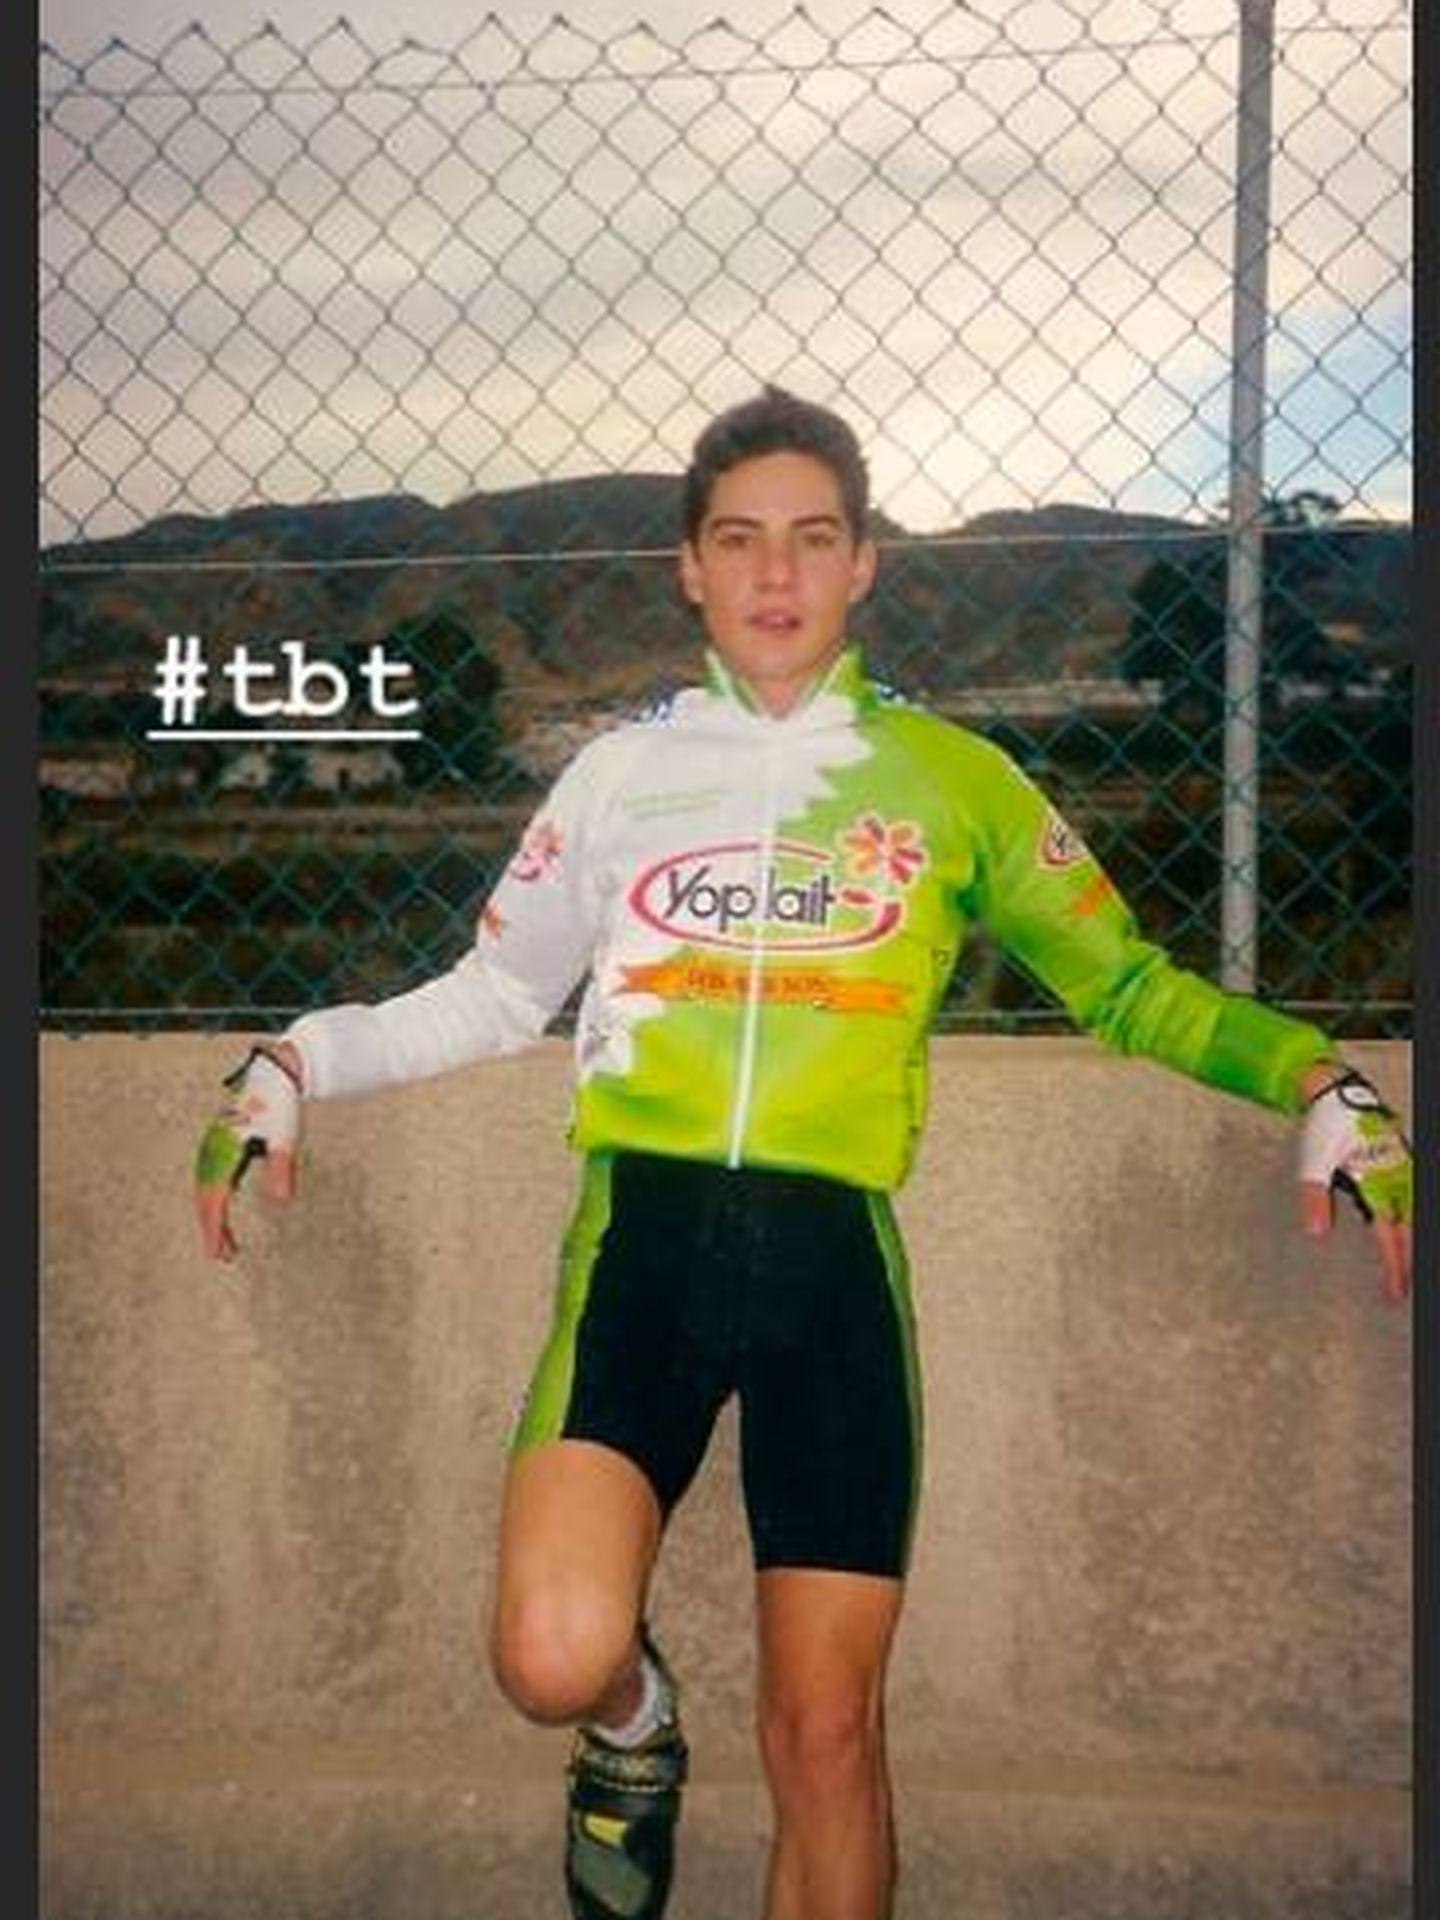 Bisbal, con el maillot en reds sociales. (Instagram)